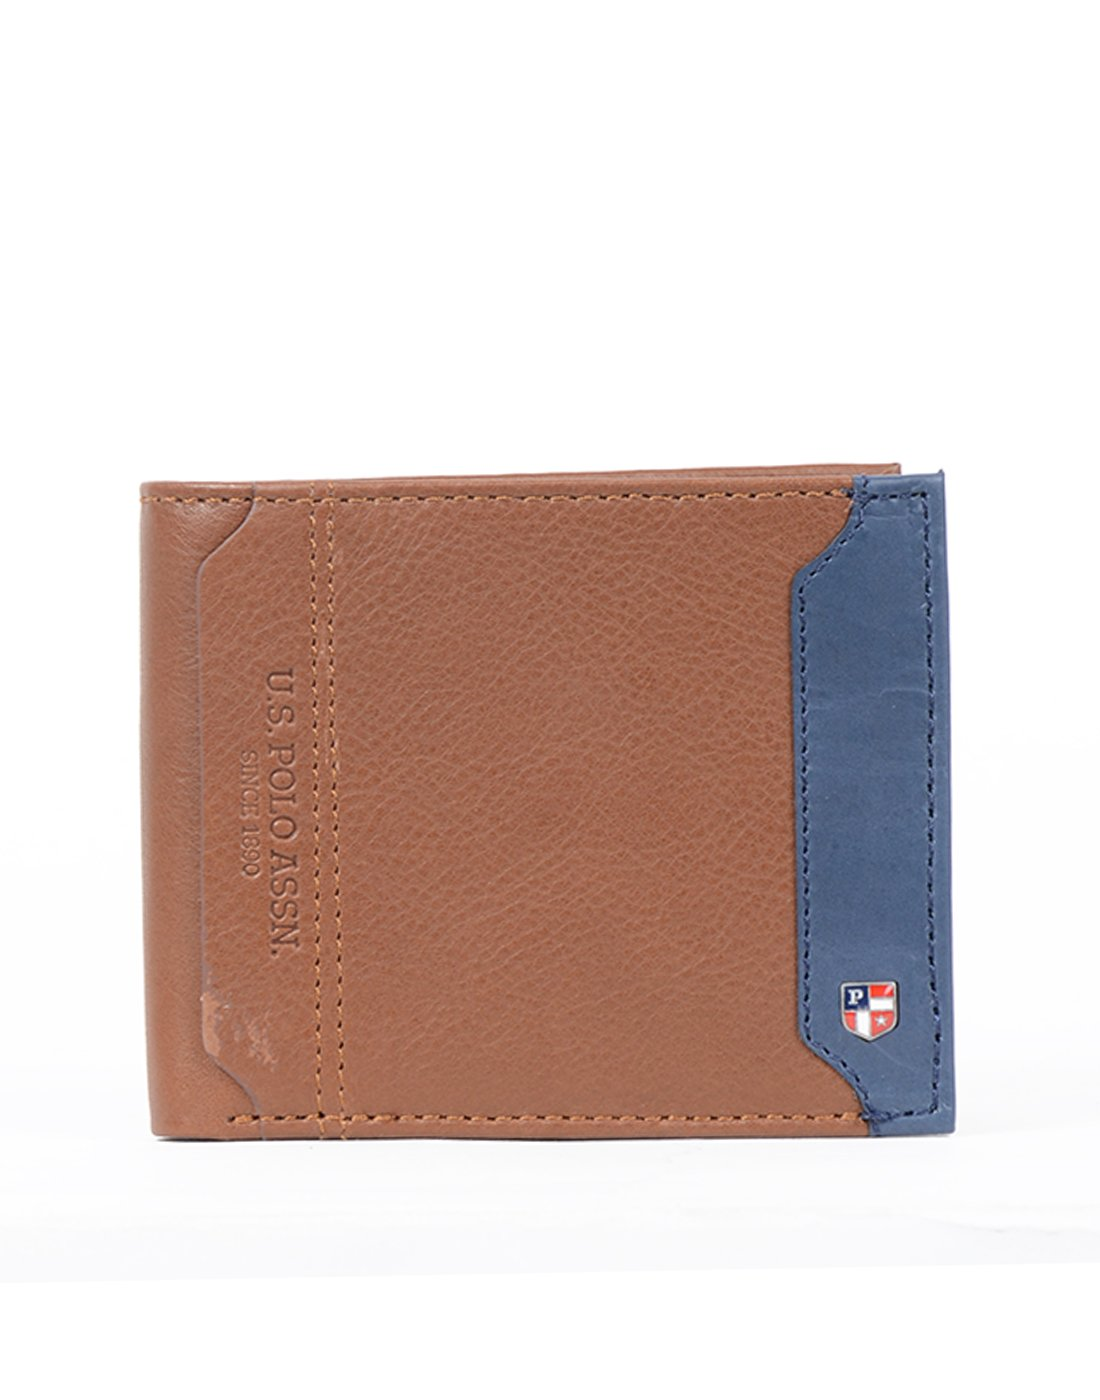 U.S.POLO.ASSN. Brown Men's Wallet (USAW0511)